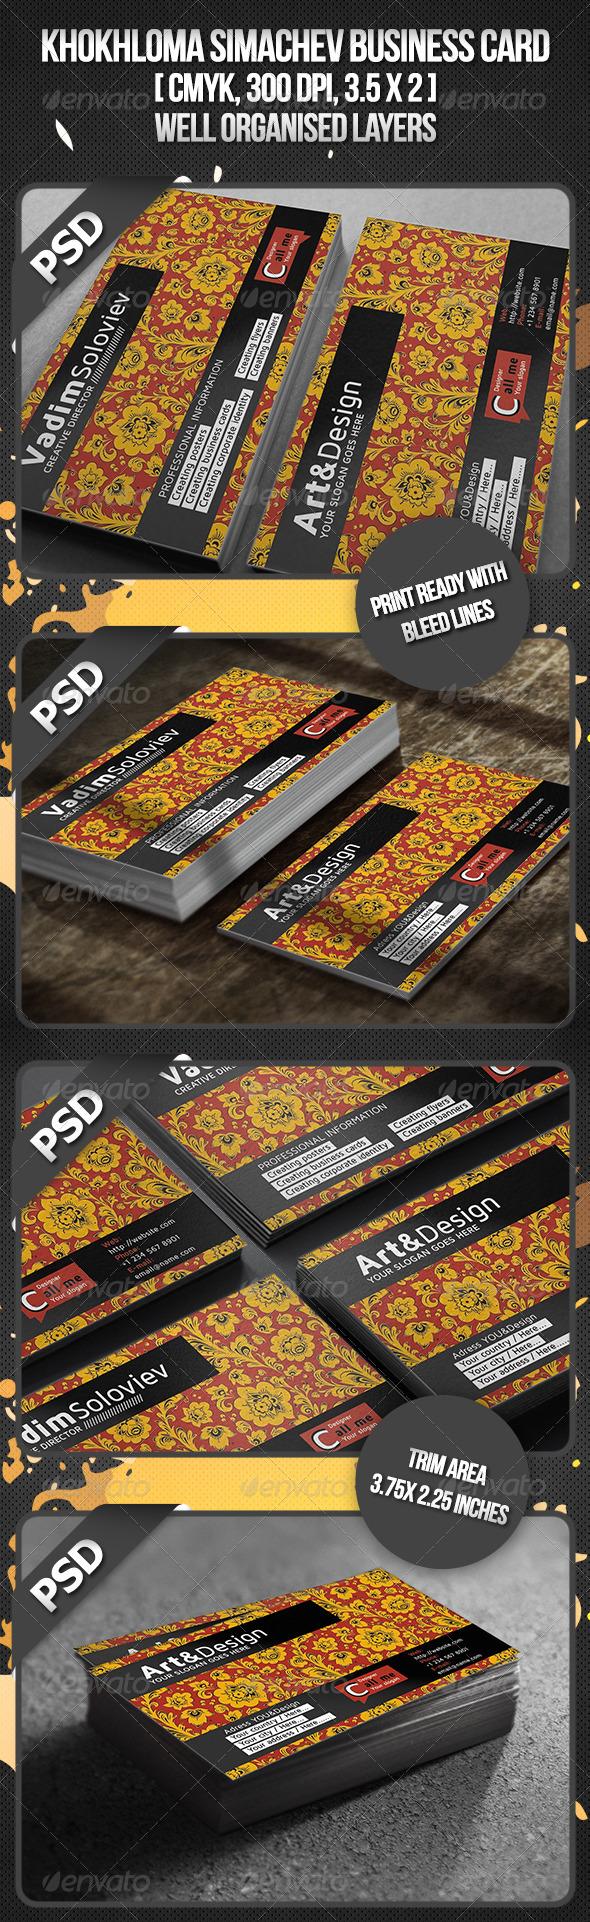 Khokhloma Simachev Business Card - Business Cards Print Templates